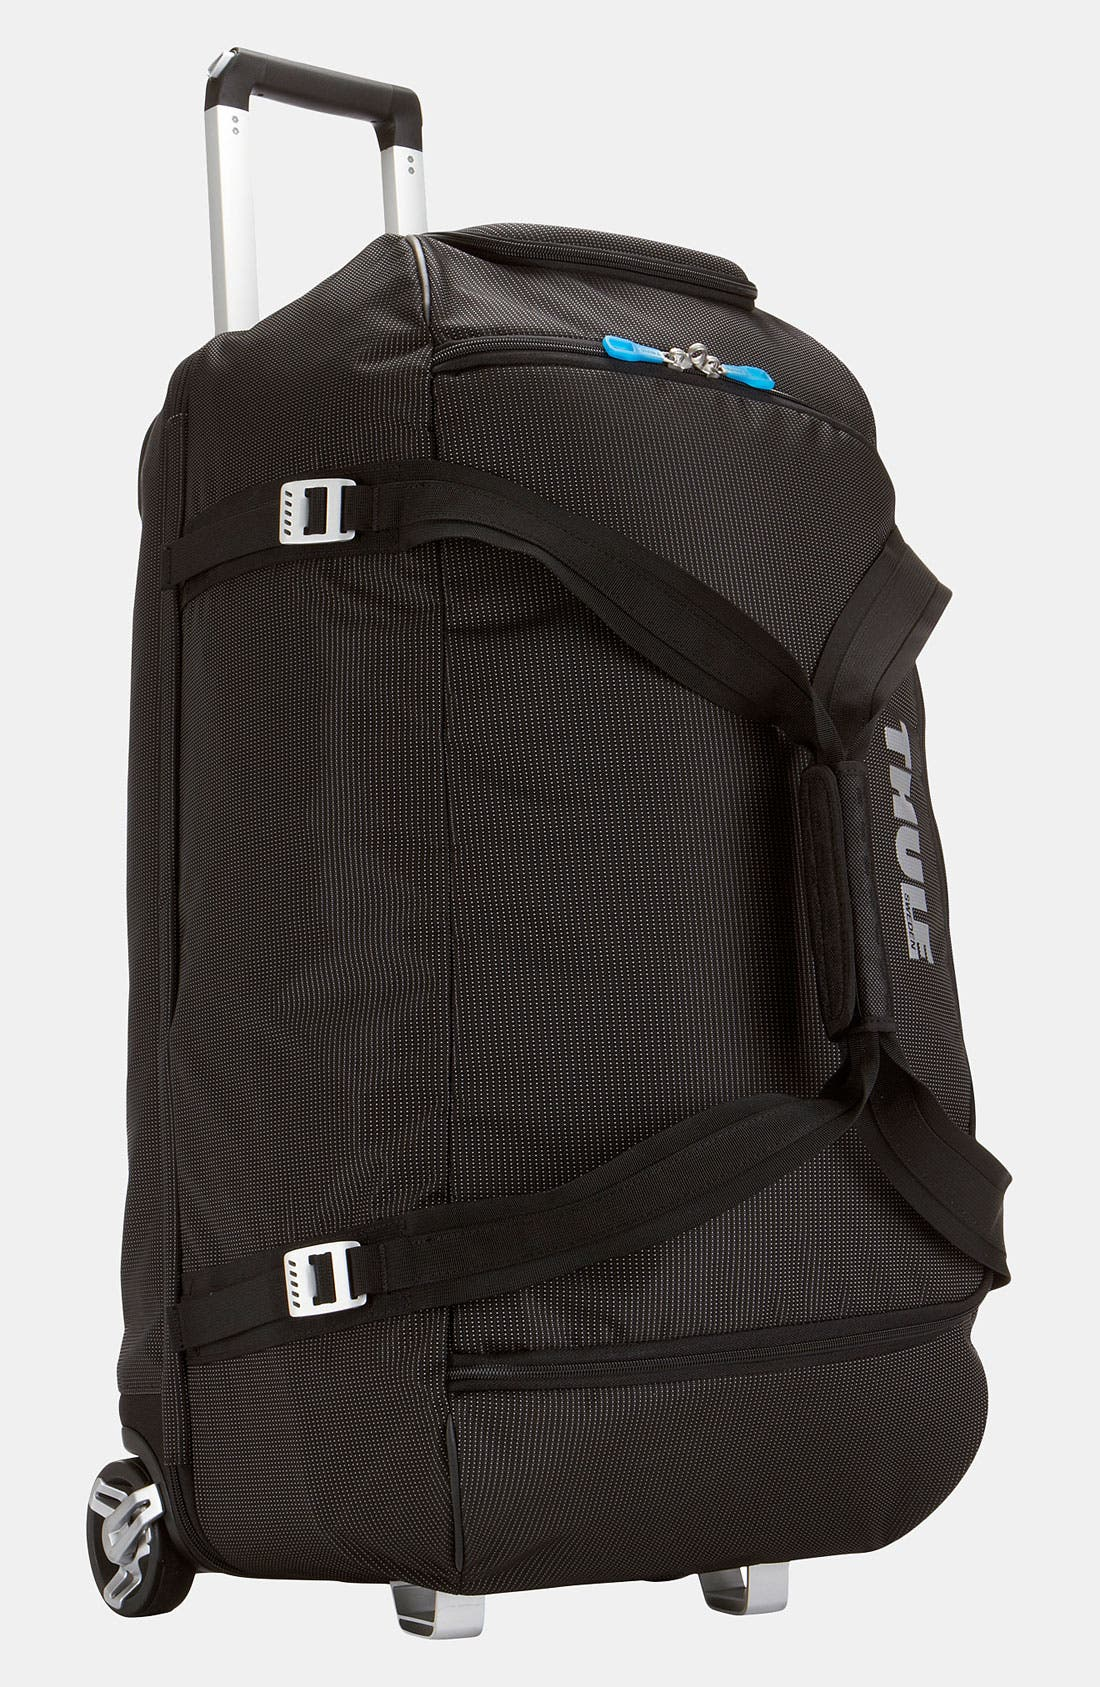 Main Image - Thule 'Crossover' Rolling Duffel Bag (87L)